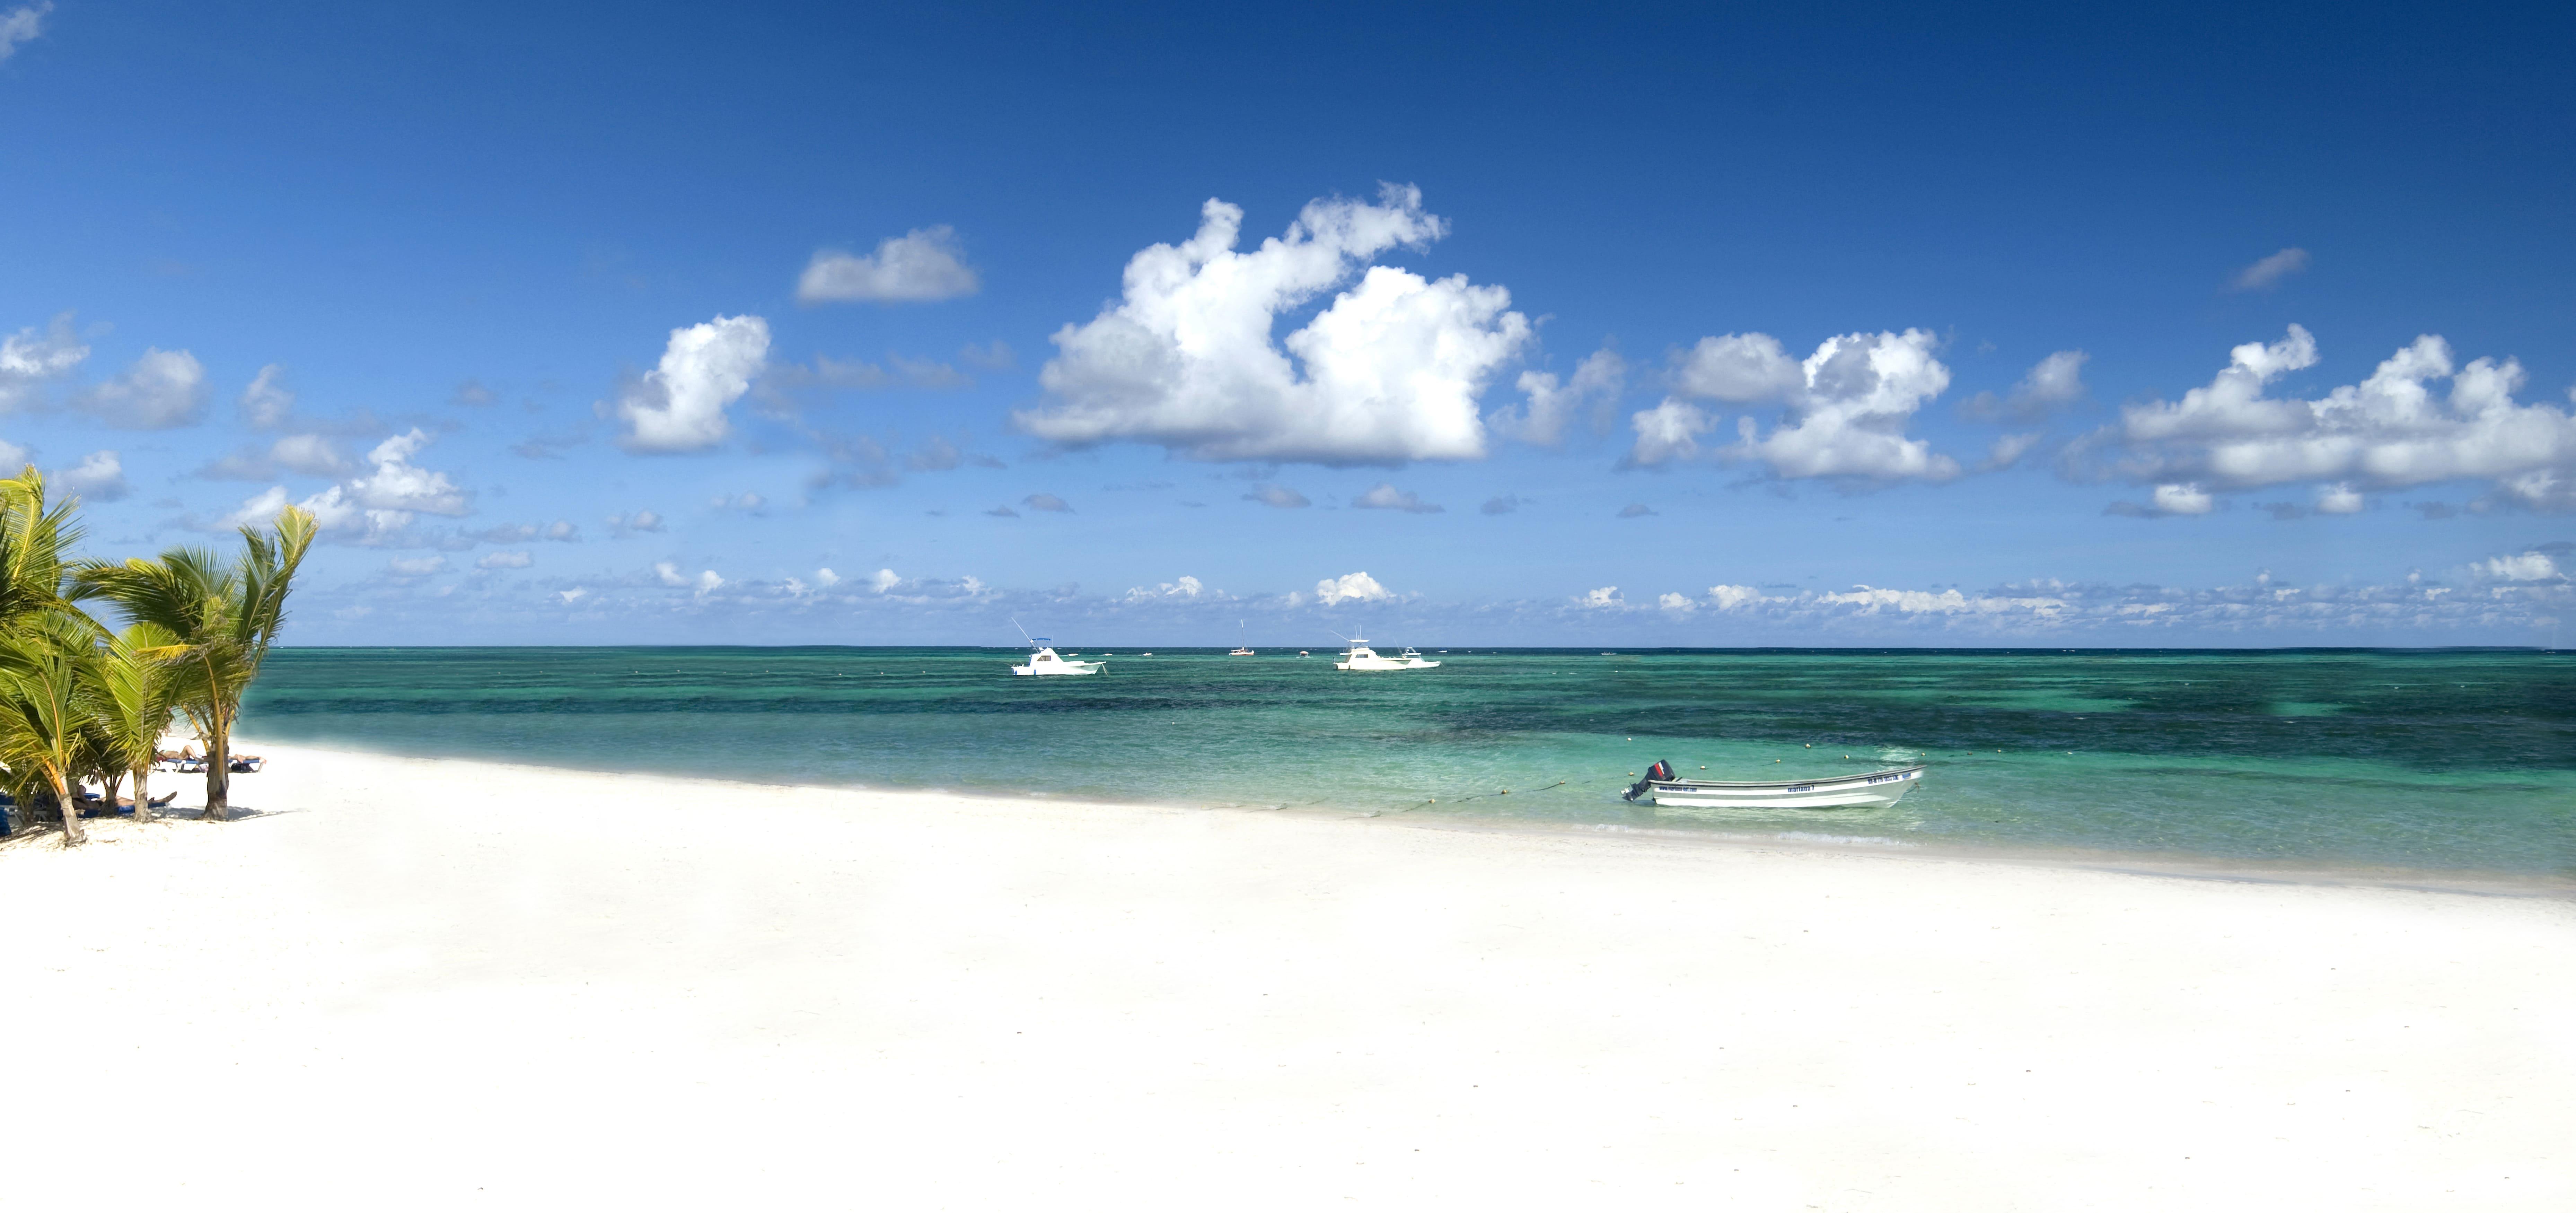 Playa Blanca en Punta Cana